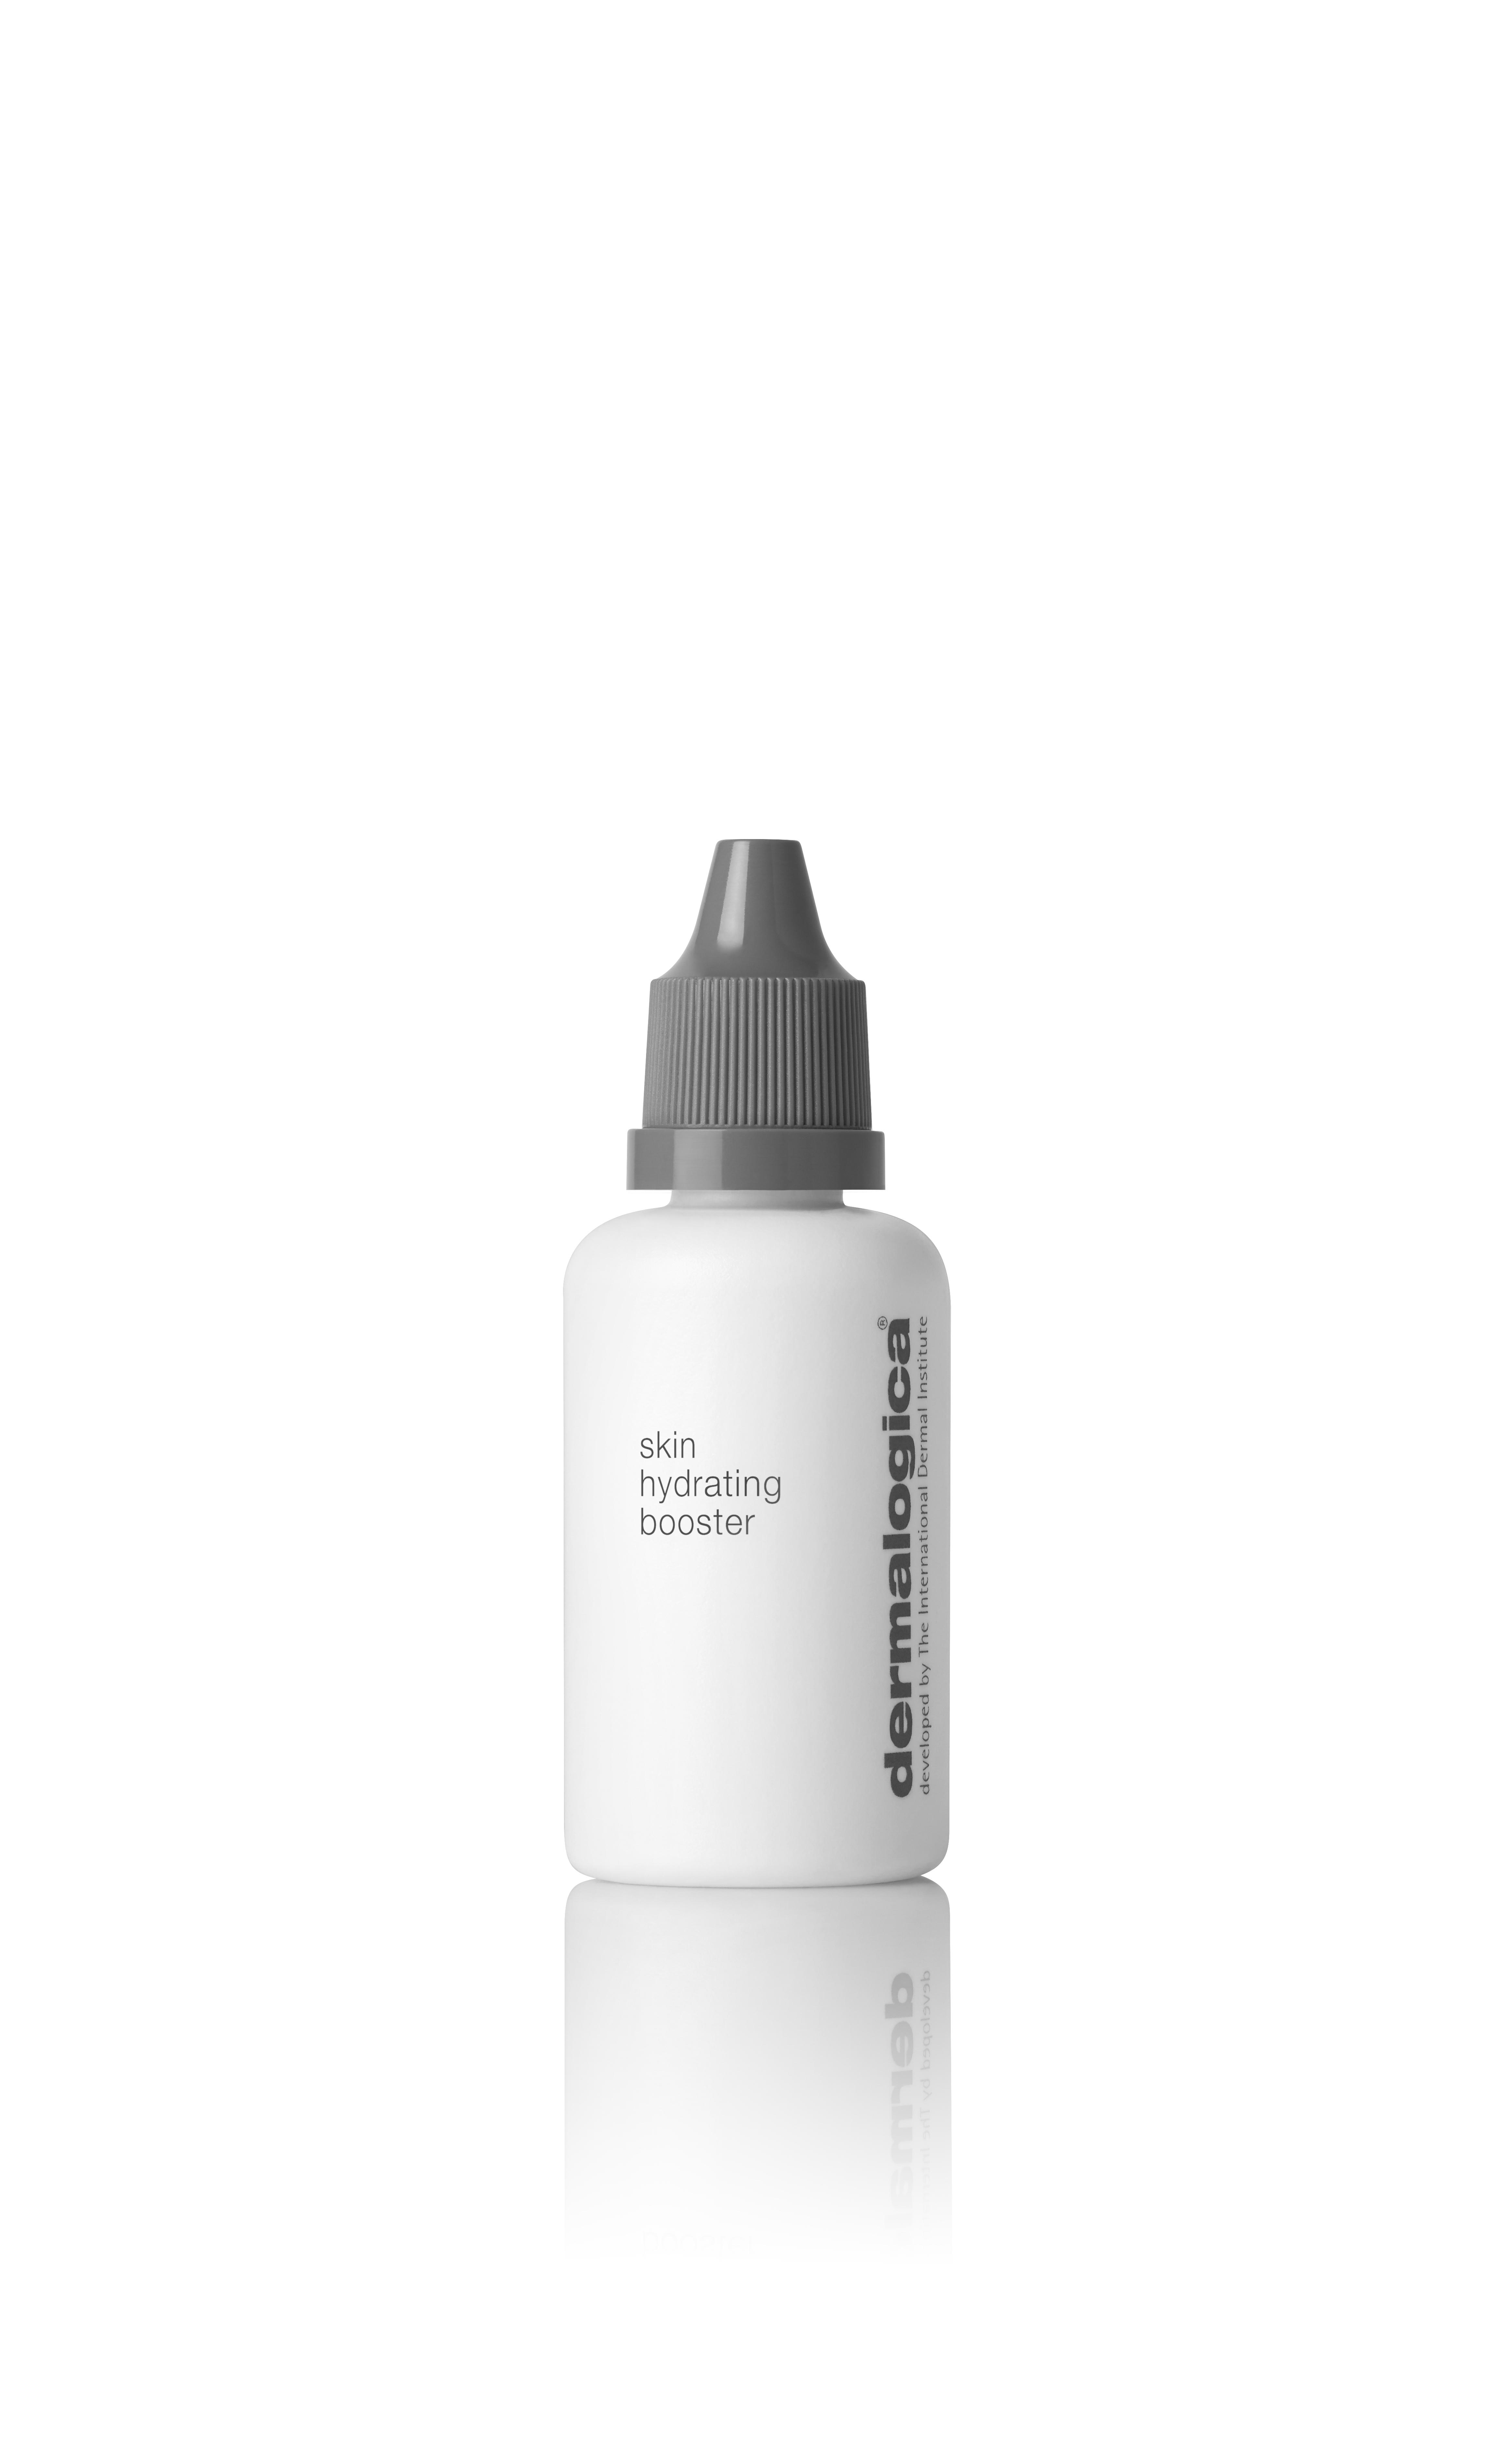 Dermalogica Skin Hydrating Booster, 30 ml